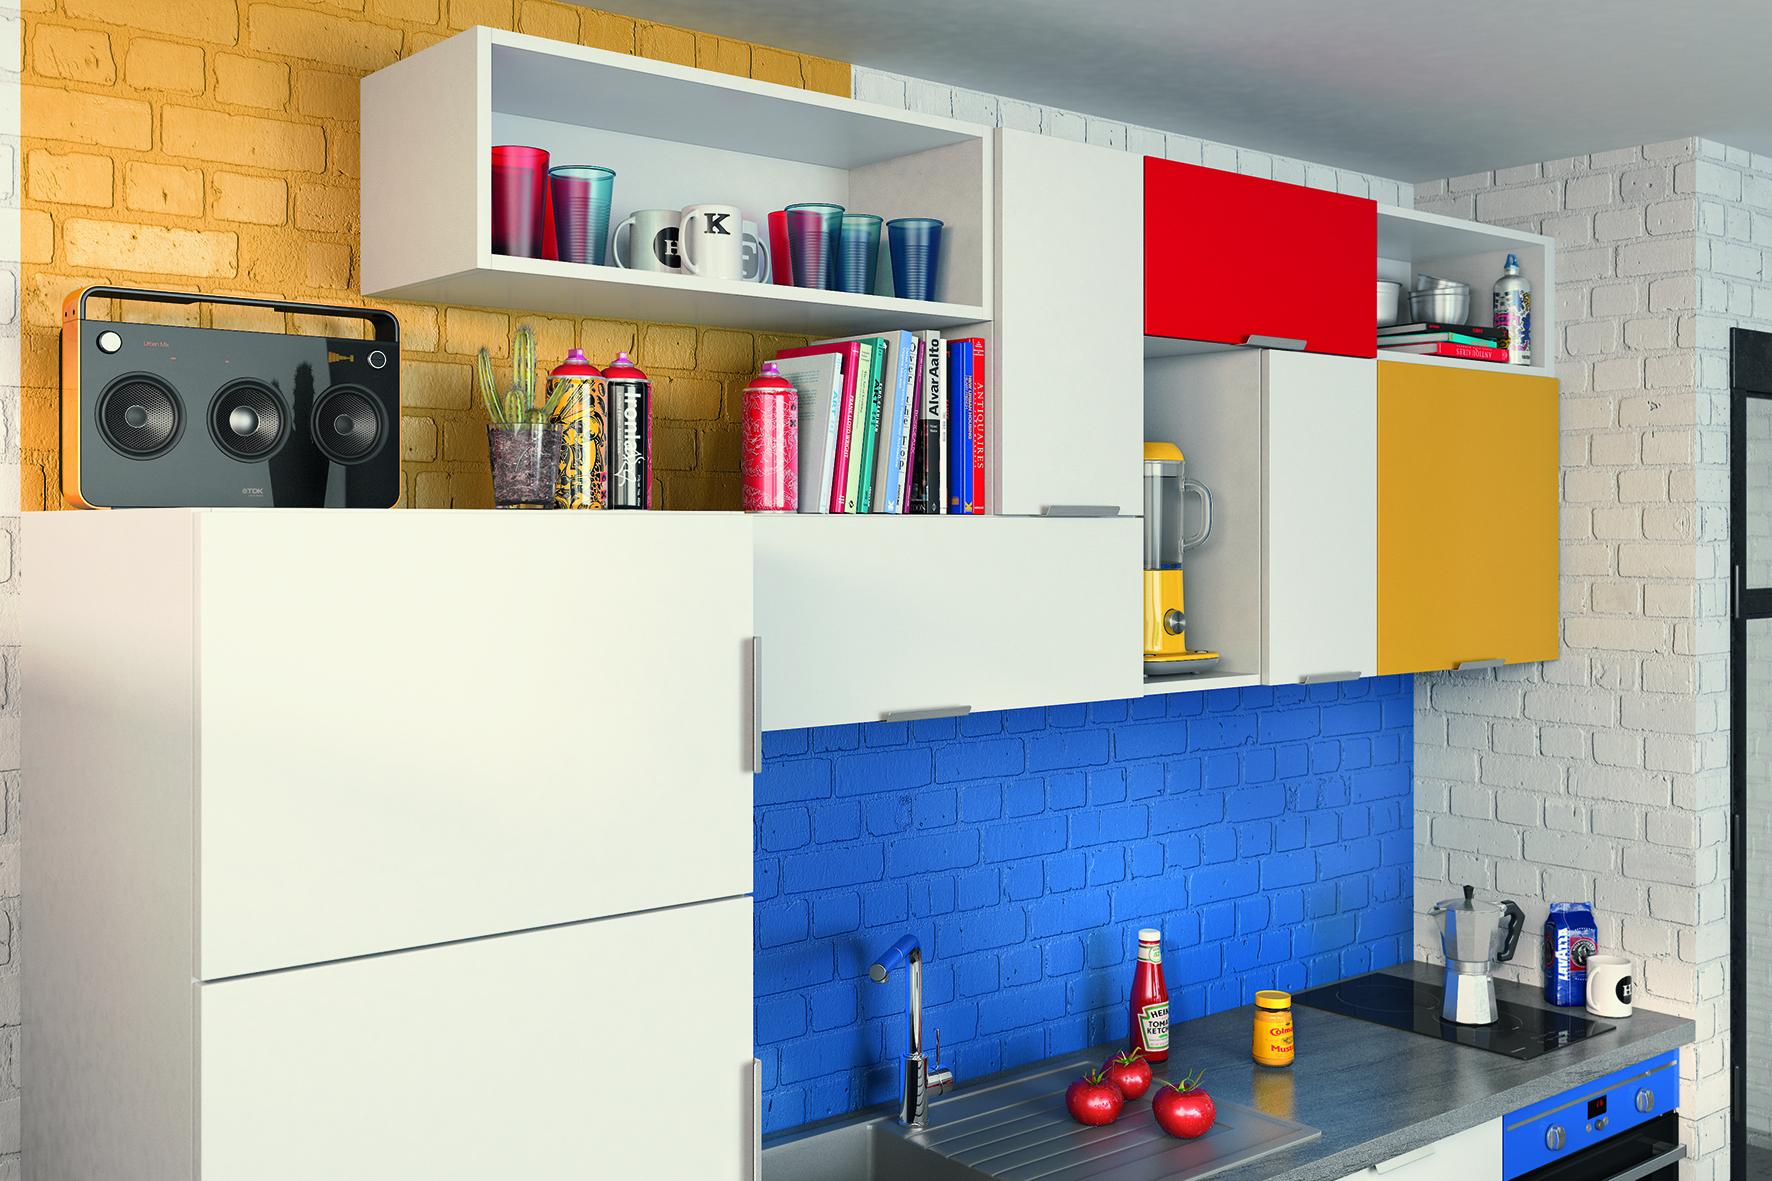 avis sur cuisine socoo c luimage contient peuttre cuisine et intrieur with avis sur cuisine. Black Bedroom Furniture Sets. Home Design Ideas